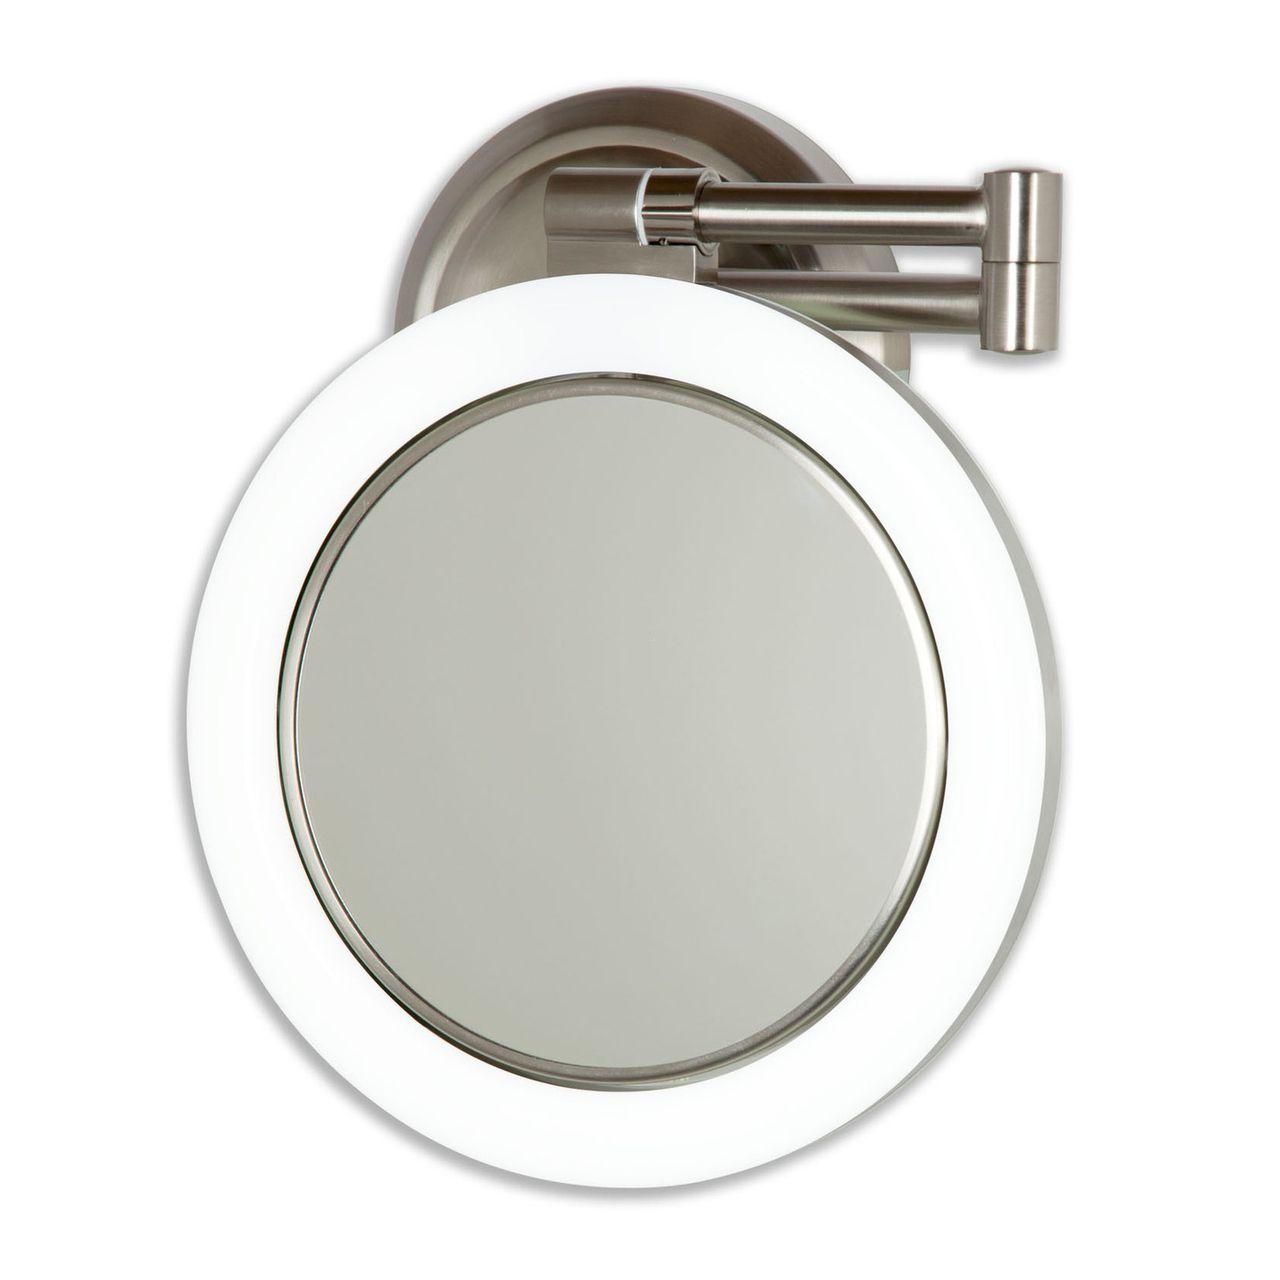 Dual-Sided Swivel Wall Mount Mirror 10X/1X | Wall mounted ...